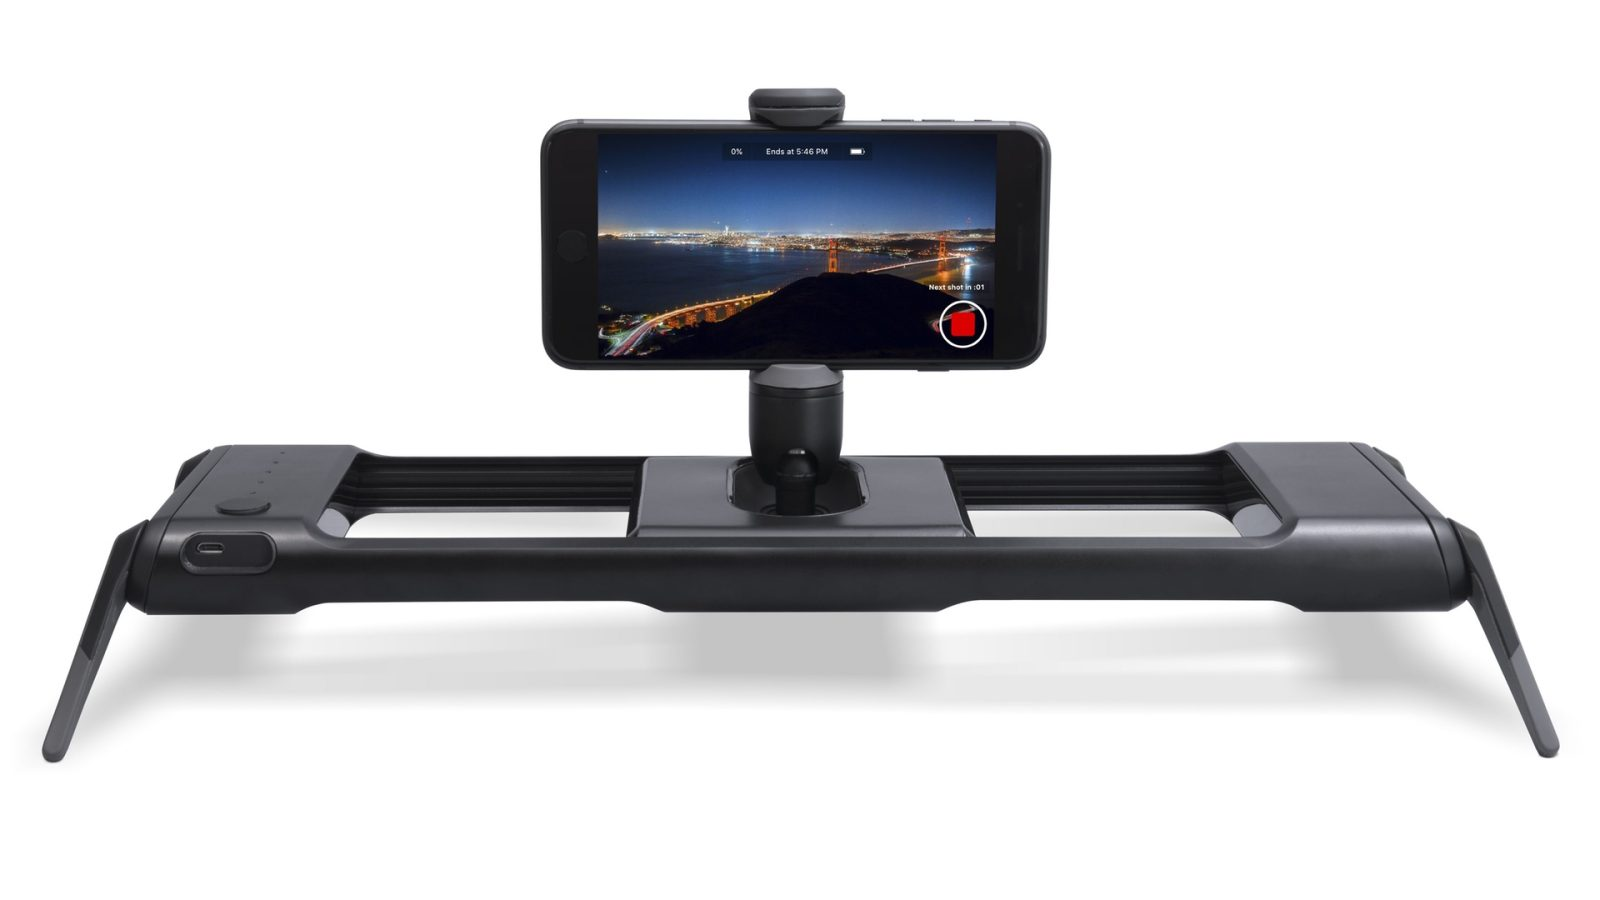 Rhino Camera Gear introduces ROV, a $229 compact motorized